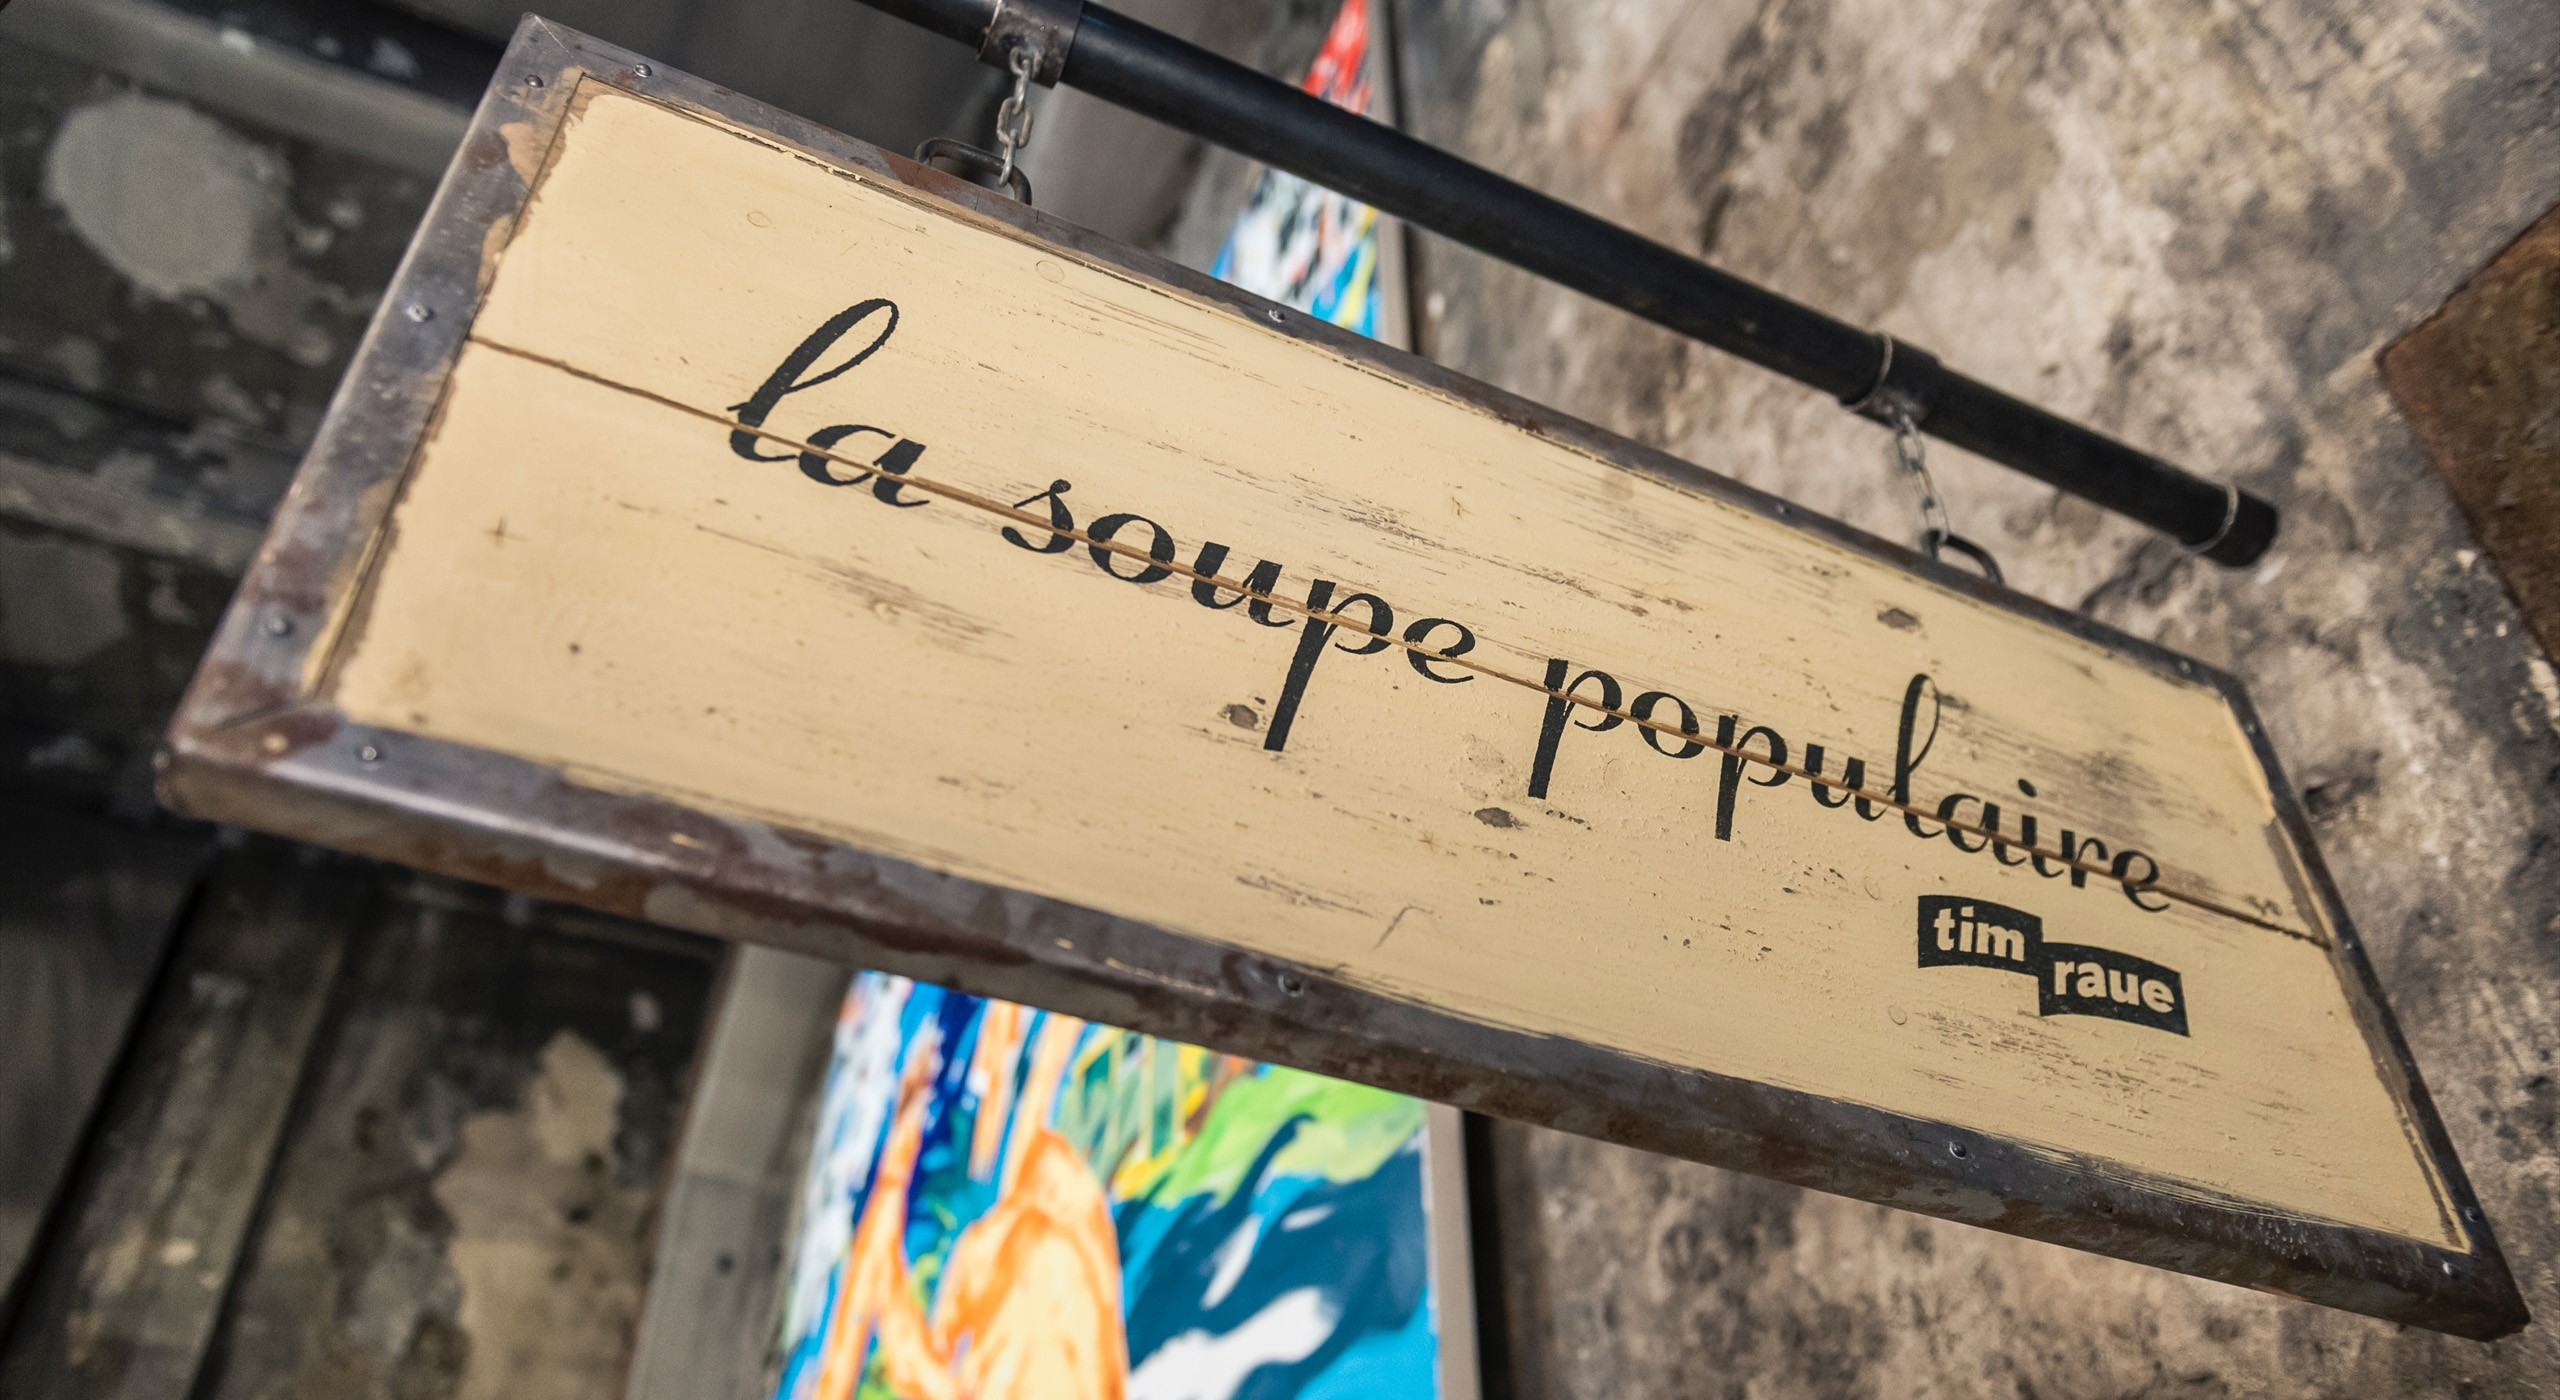 Nasenschild La Soupe Populaire aus der Froschperspektive fotografiert © FTWild